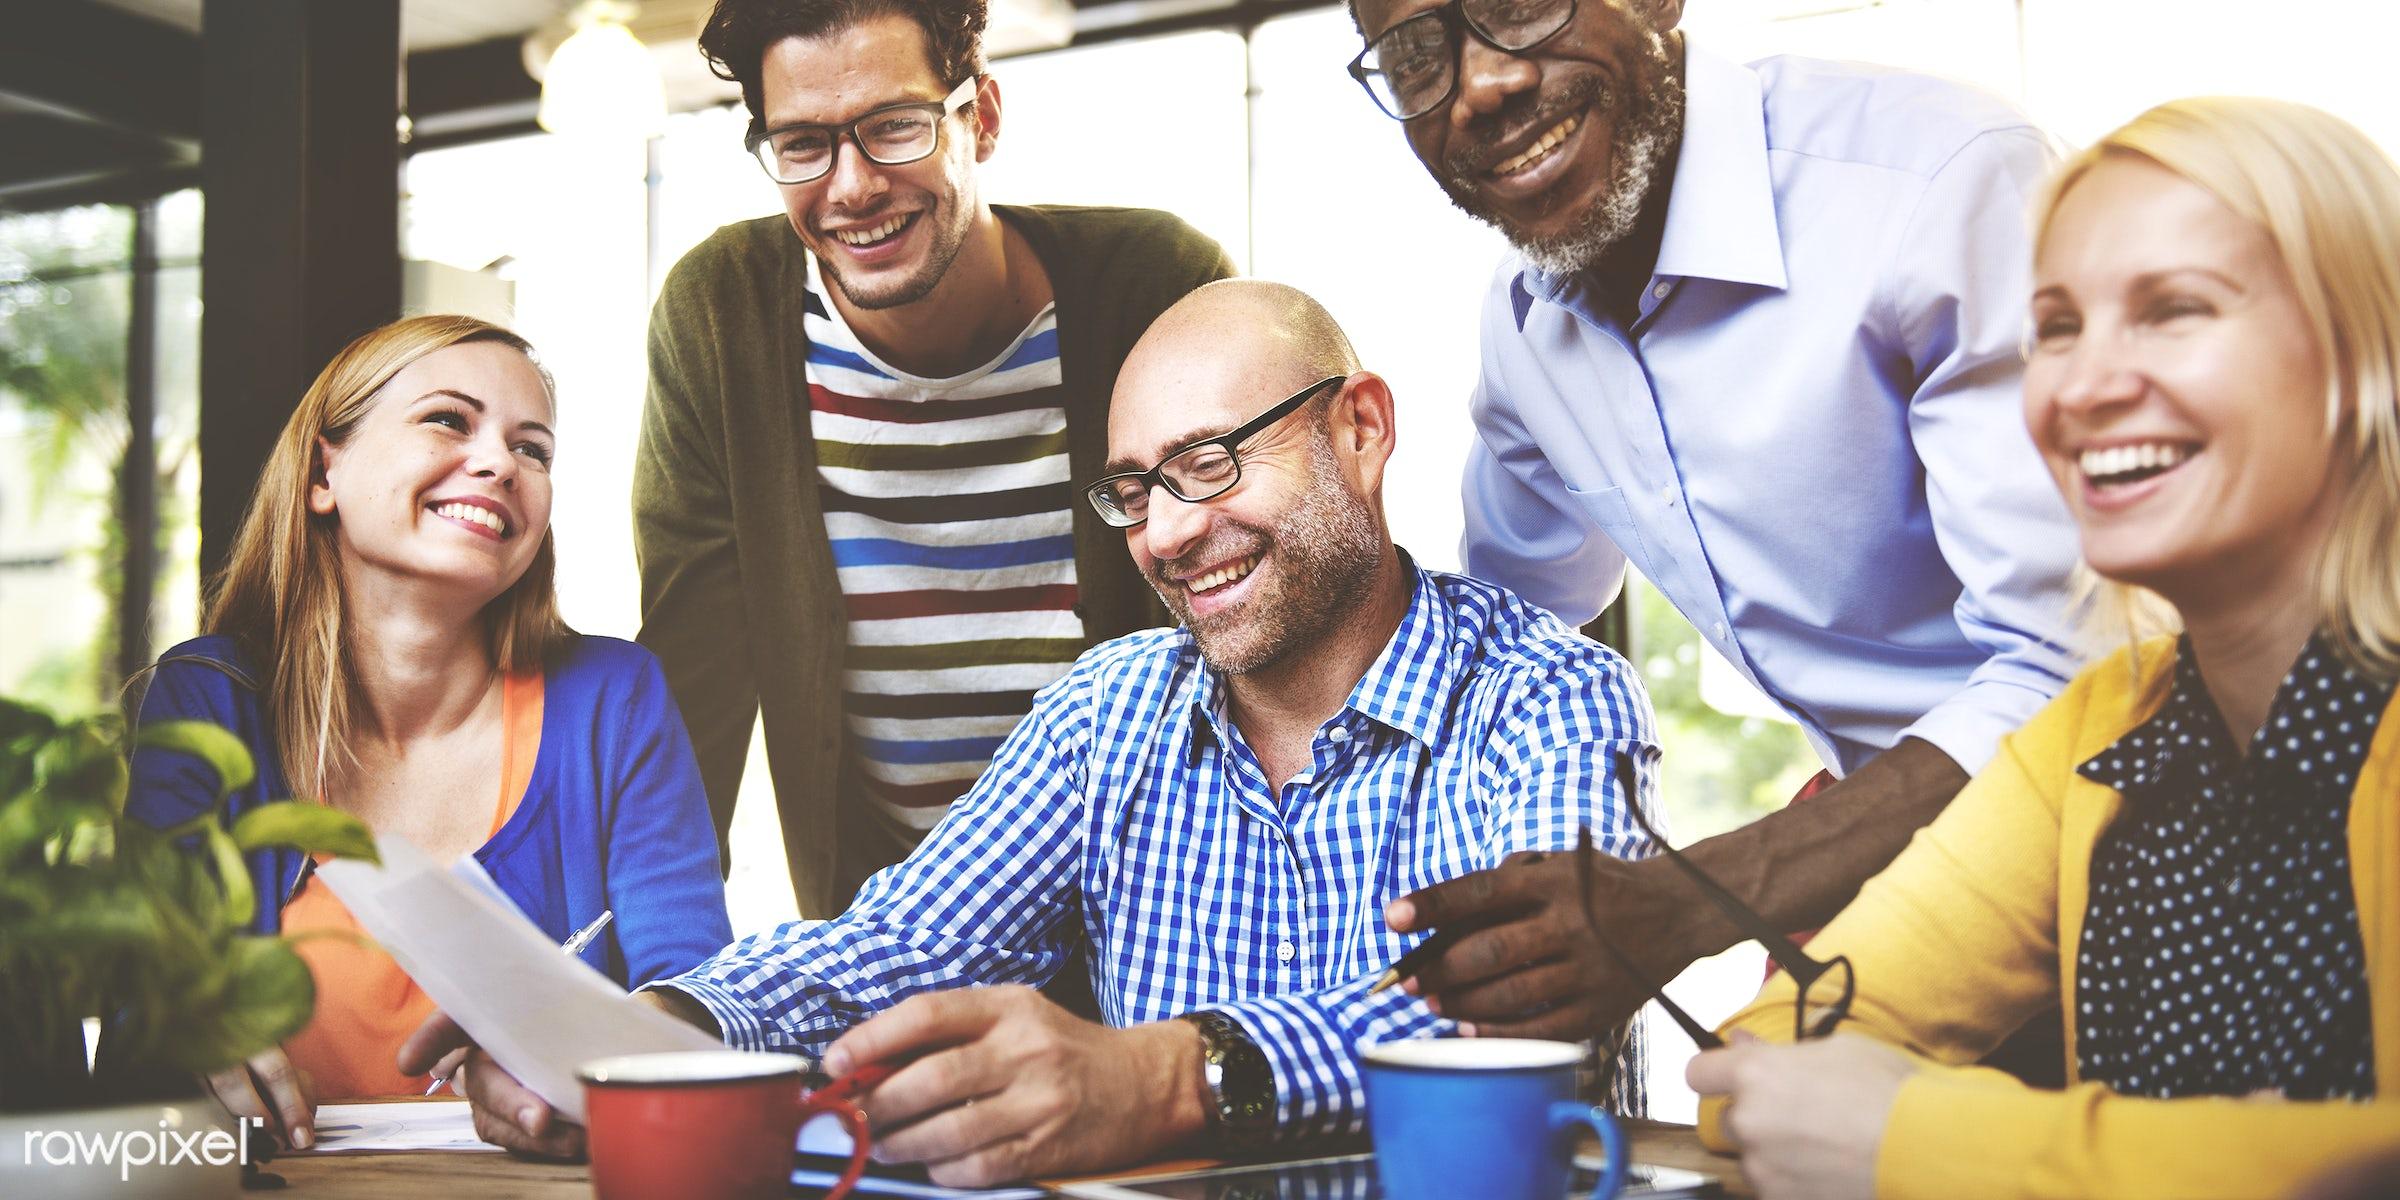 People Meeting Communication Corporate Teamwork Concept - beverage, bonding, cafe, caucasian, cheerful, coffee, community,...